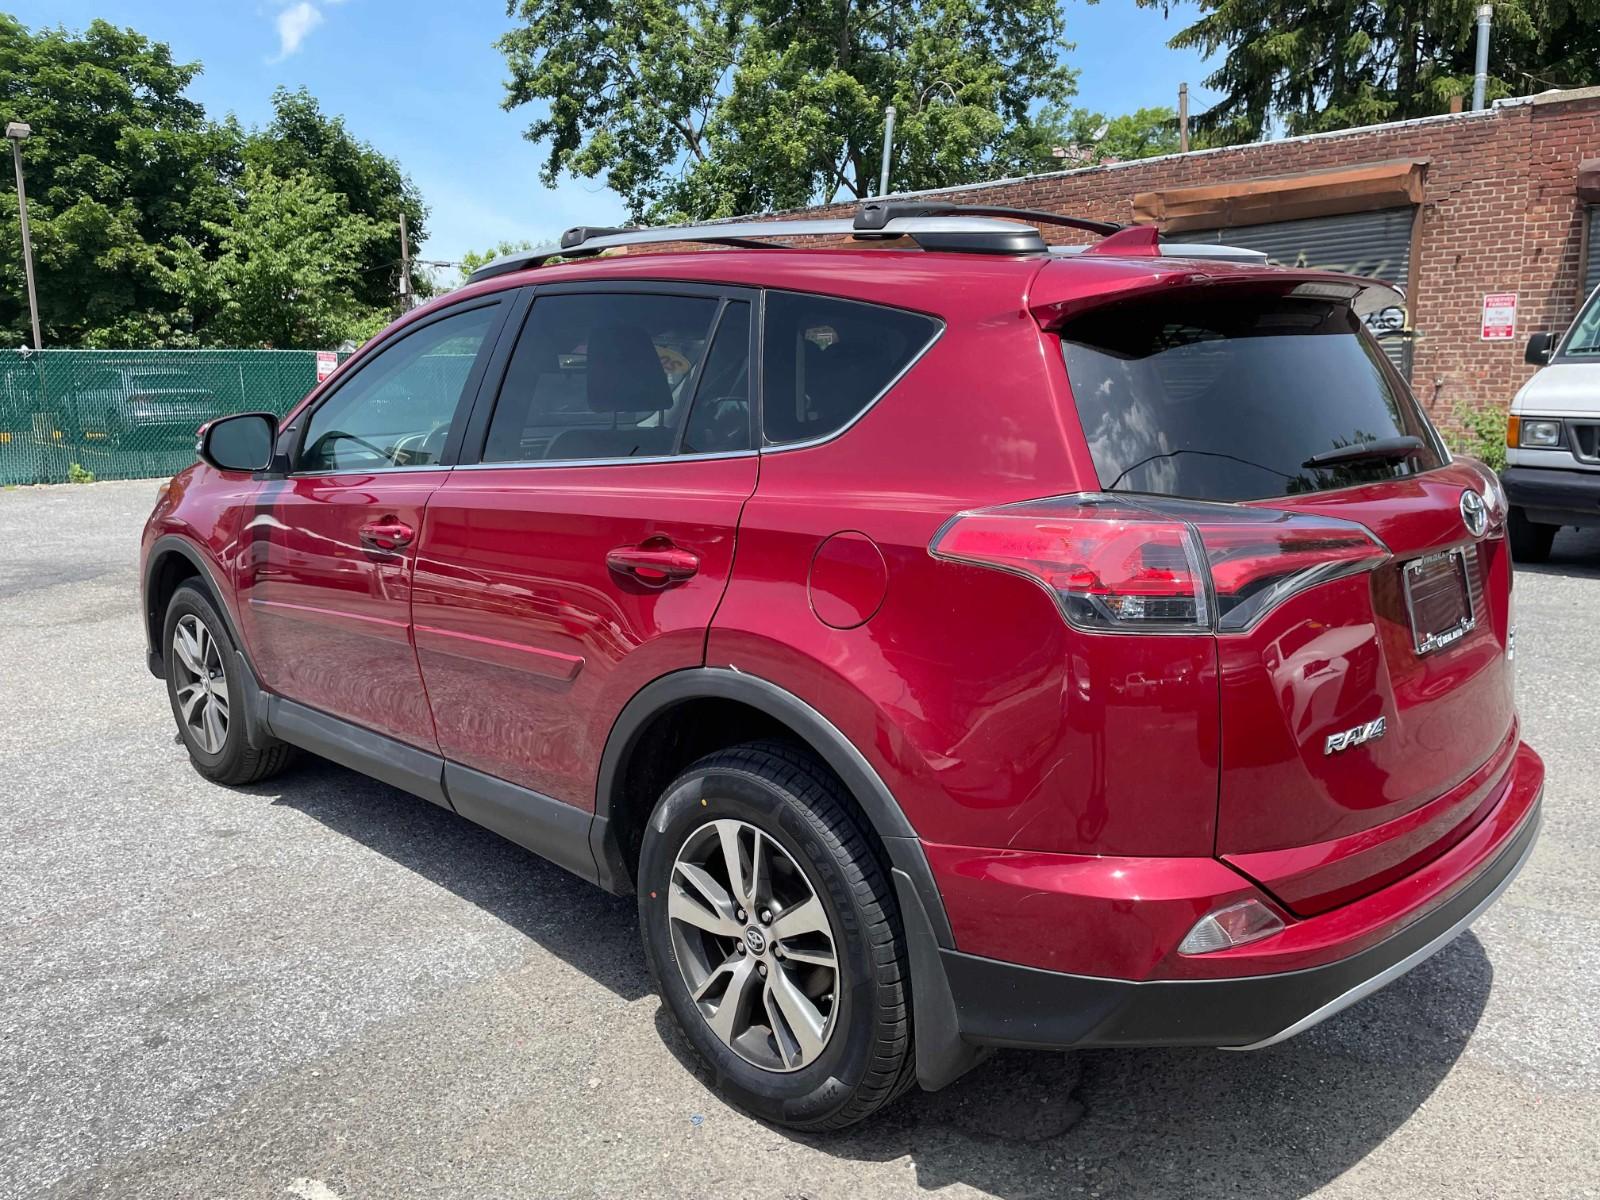 2018 Toyota RAV4 xle AWD开了37000 miles 有天窗蓝牙 盲点辅助 和倒车影像 一首车主 欢迎来看车咨询